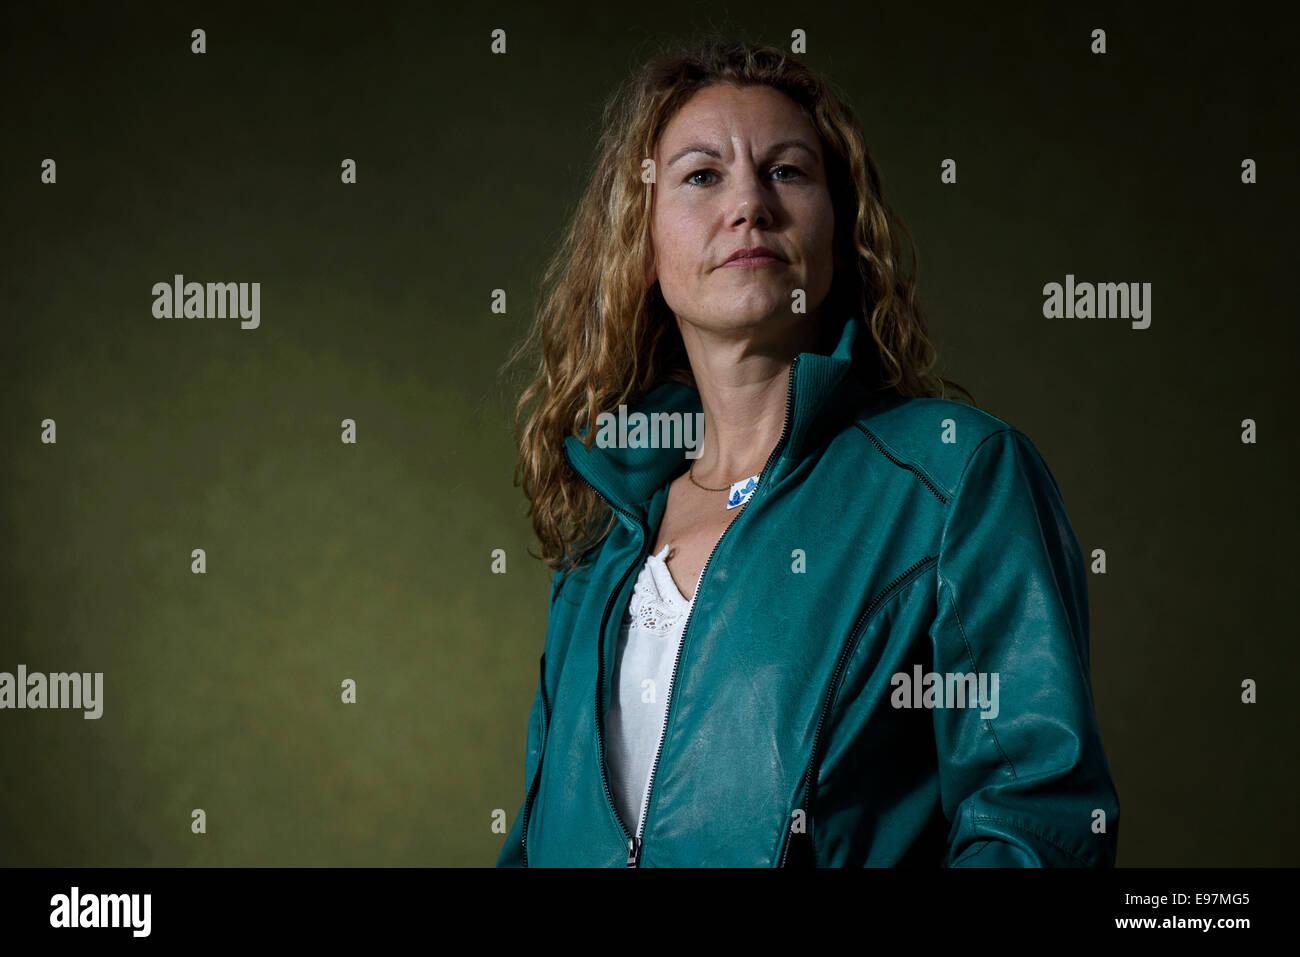 Scottish writer and poet Kate Tough  appears at the Edinburgh International Book Festival. - Stock Image